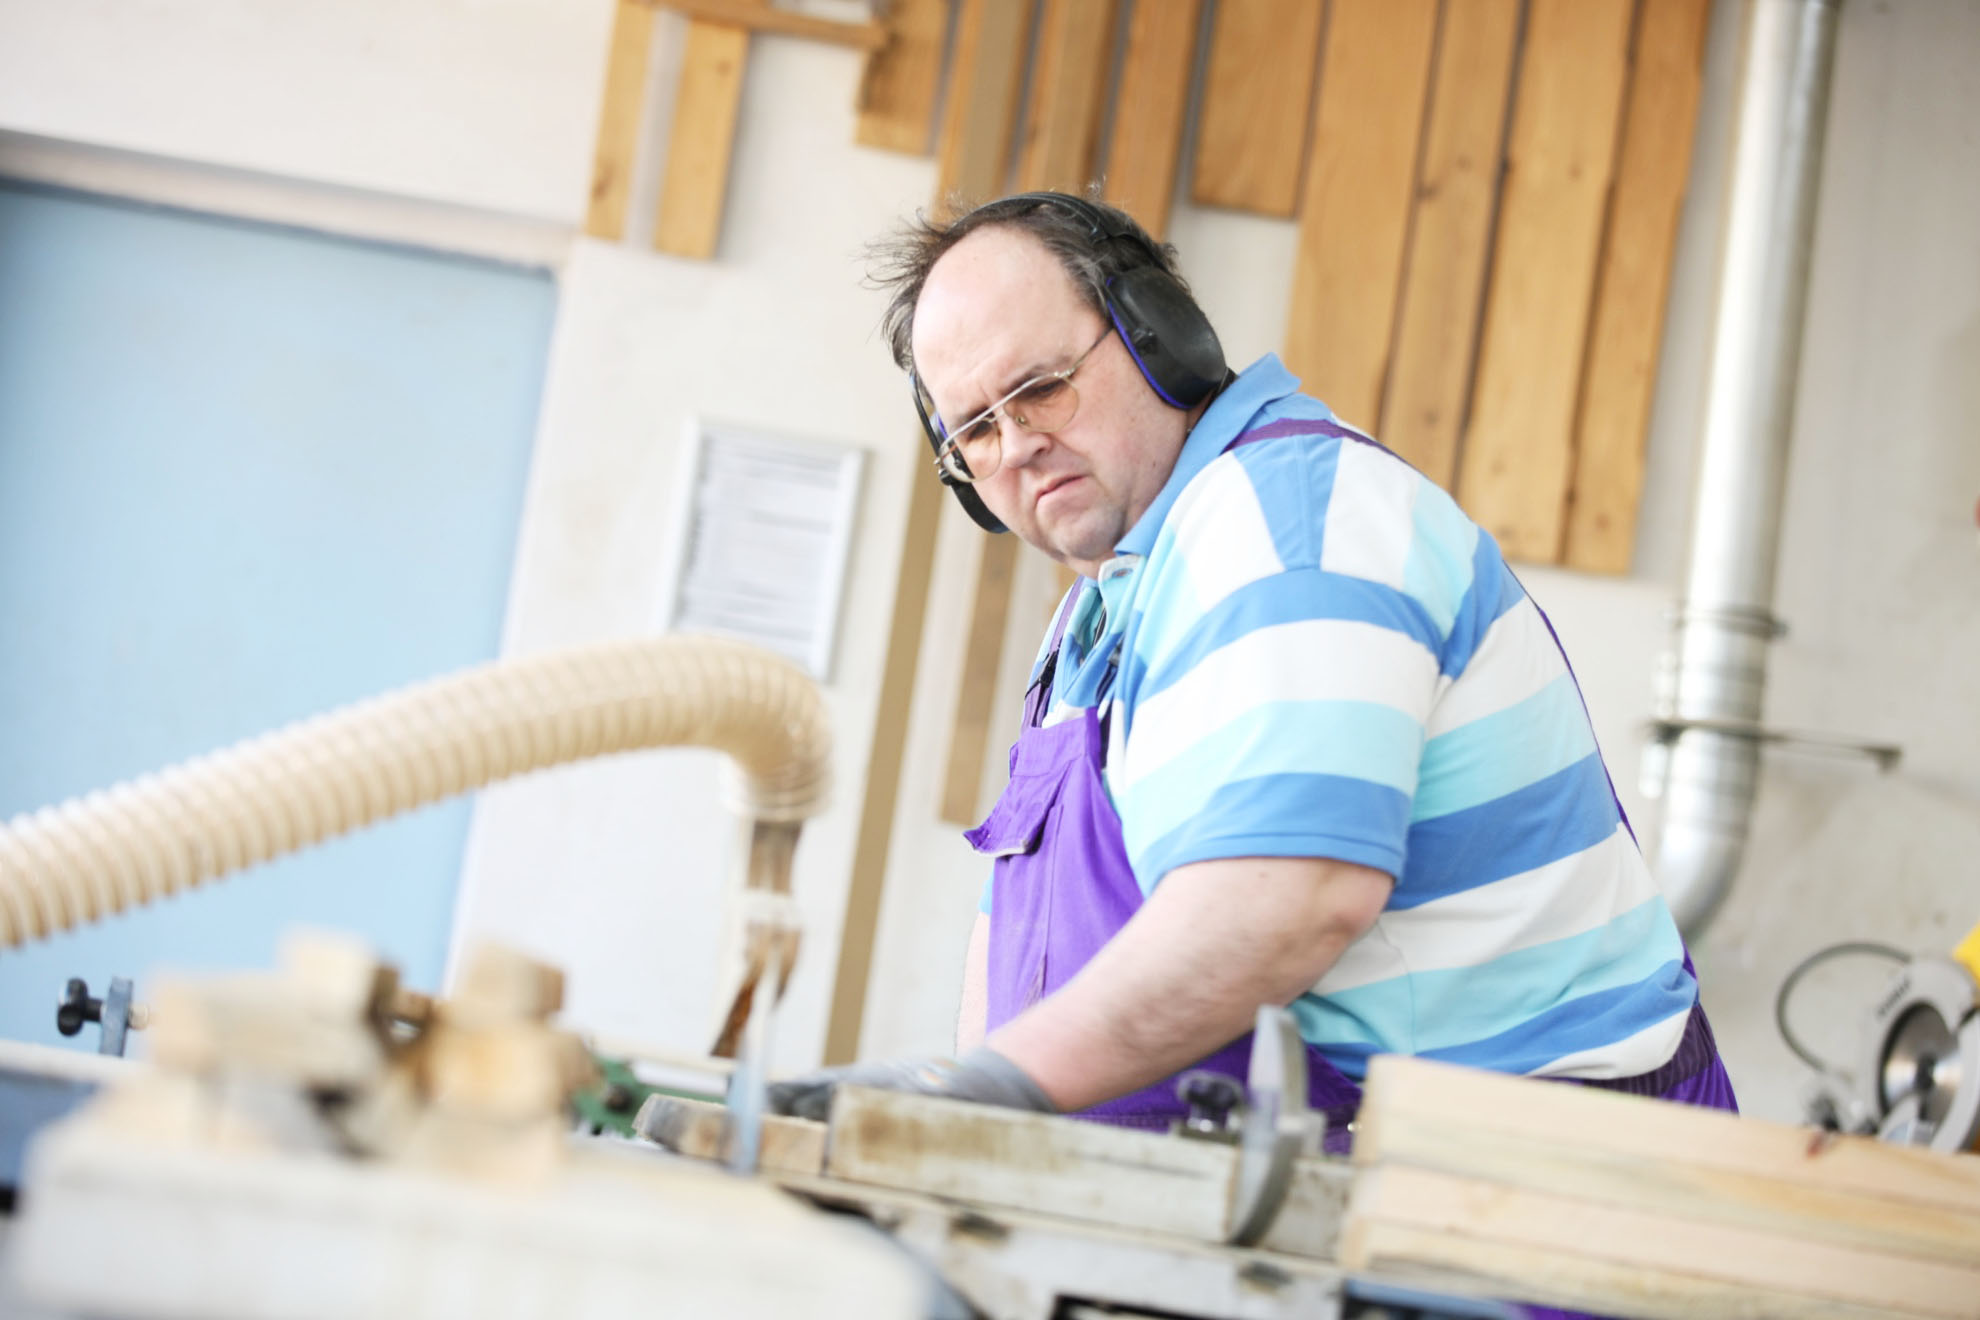 Mann schneidet Holz